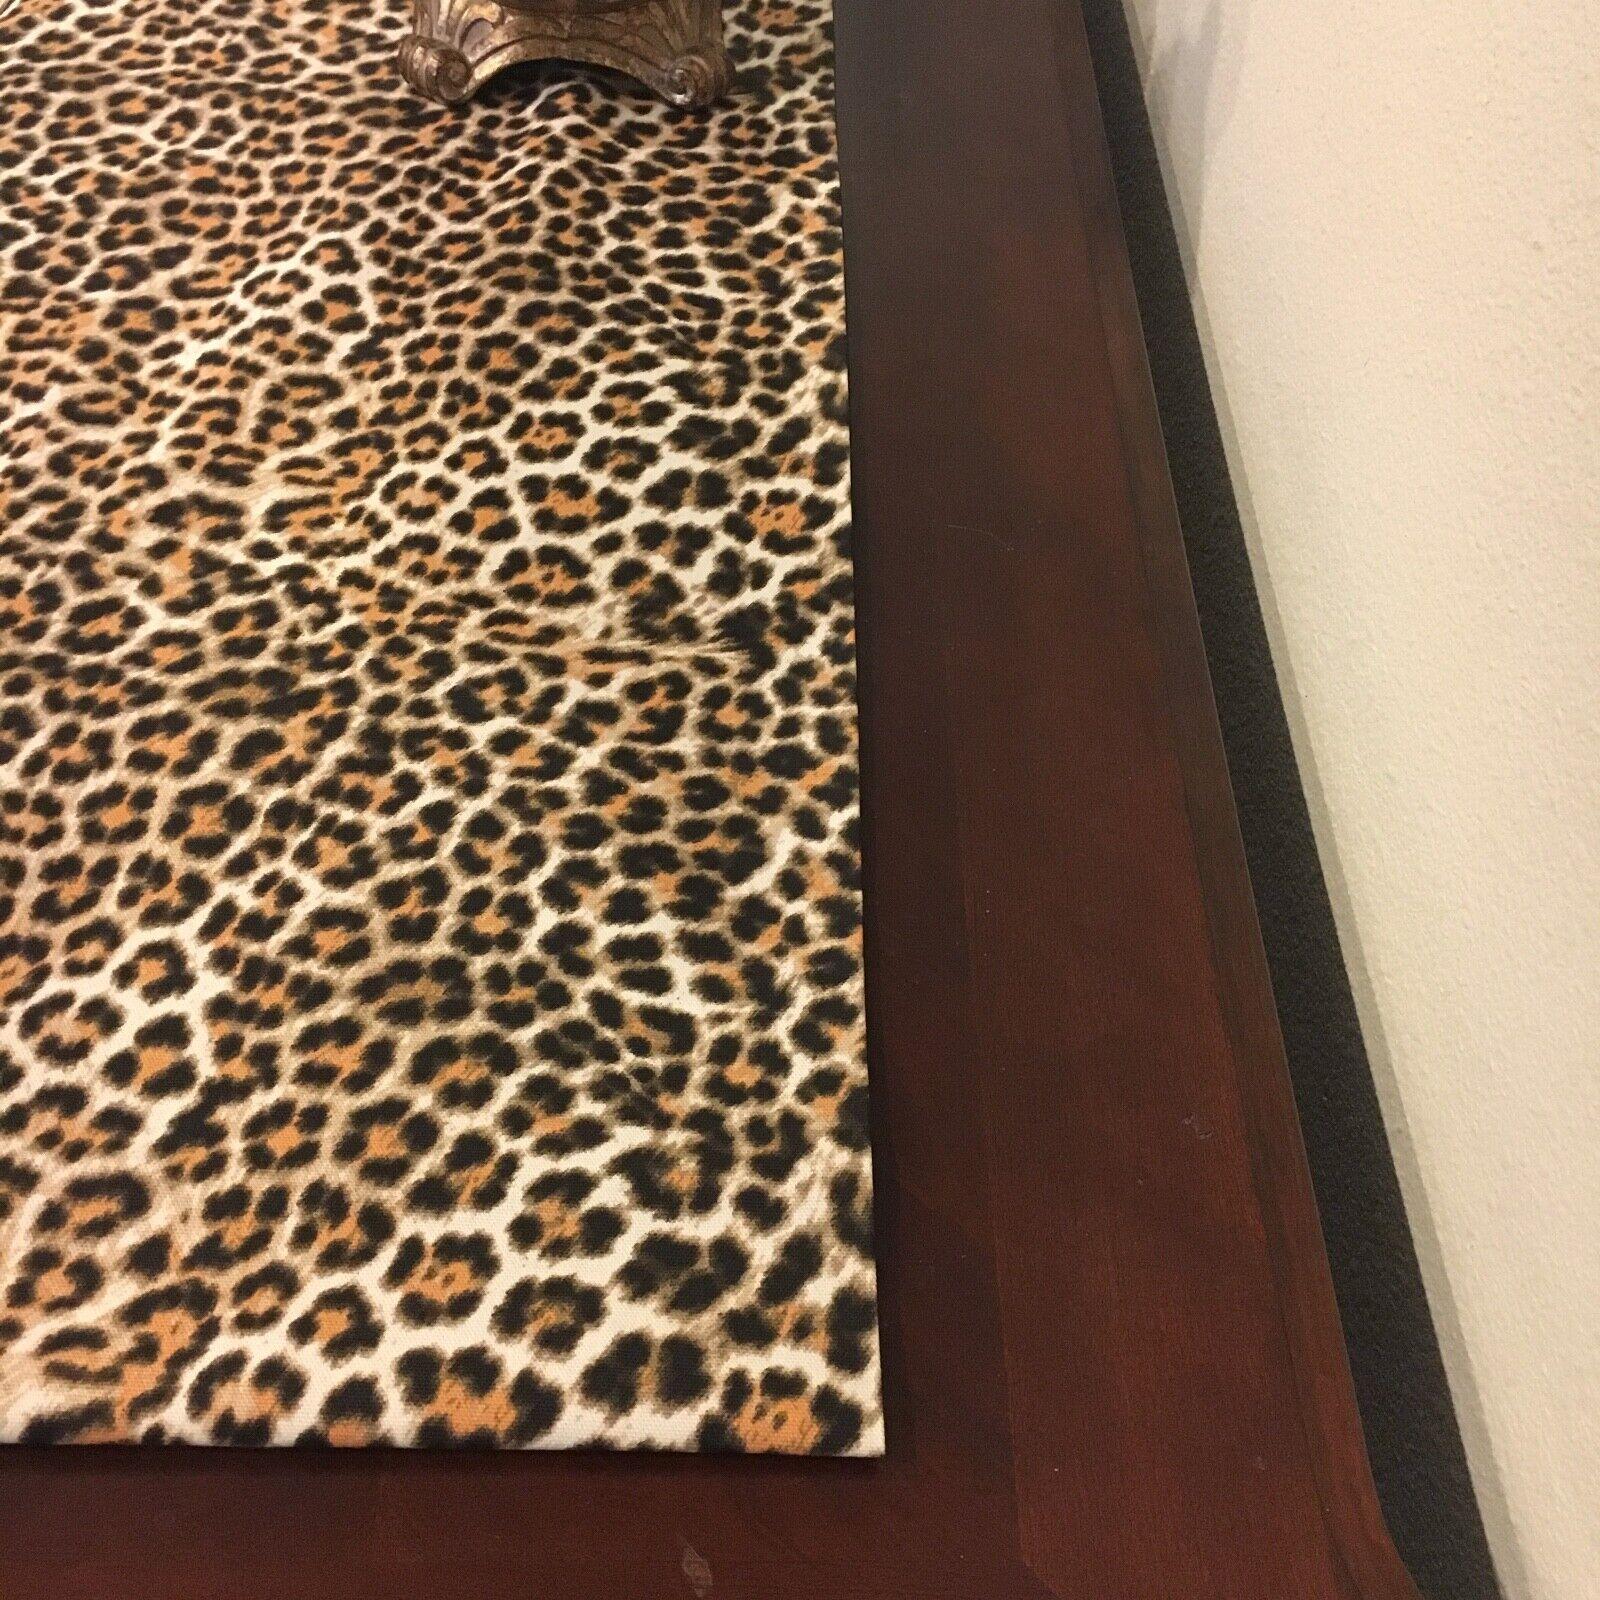 Leopard animal print Table Runner. Table decor animal print.